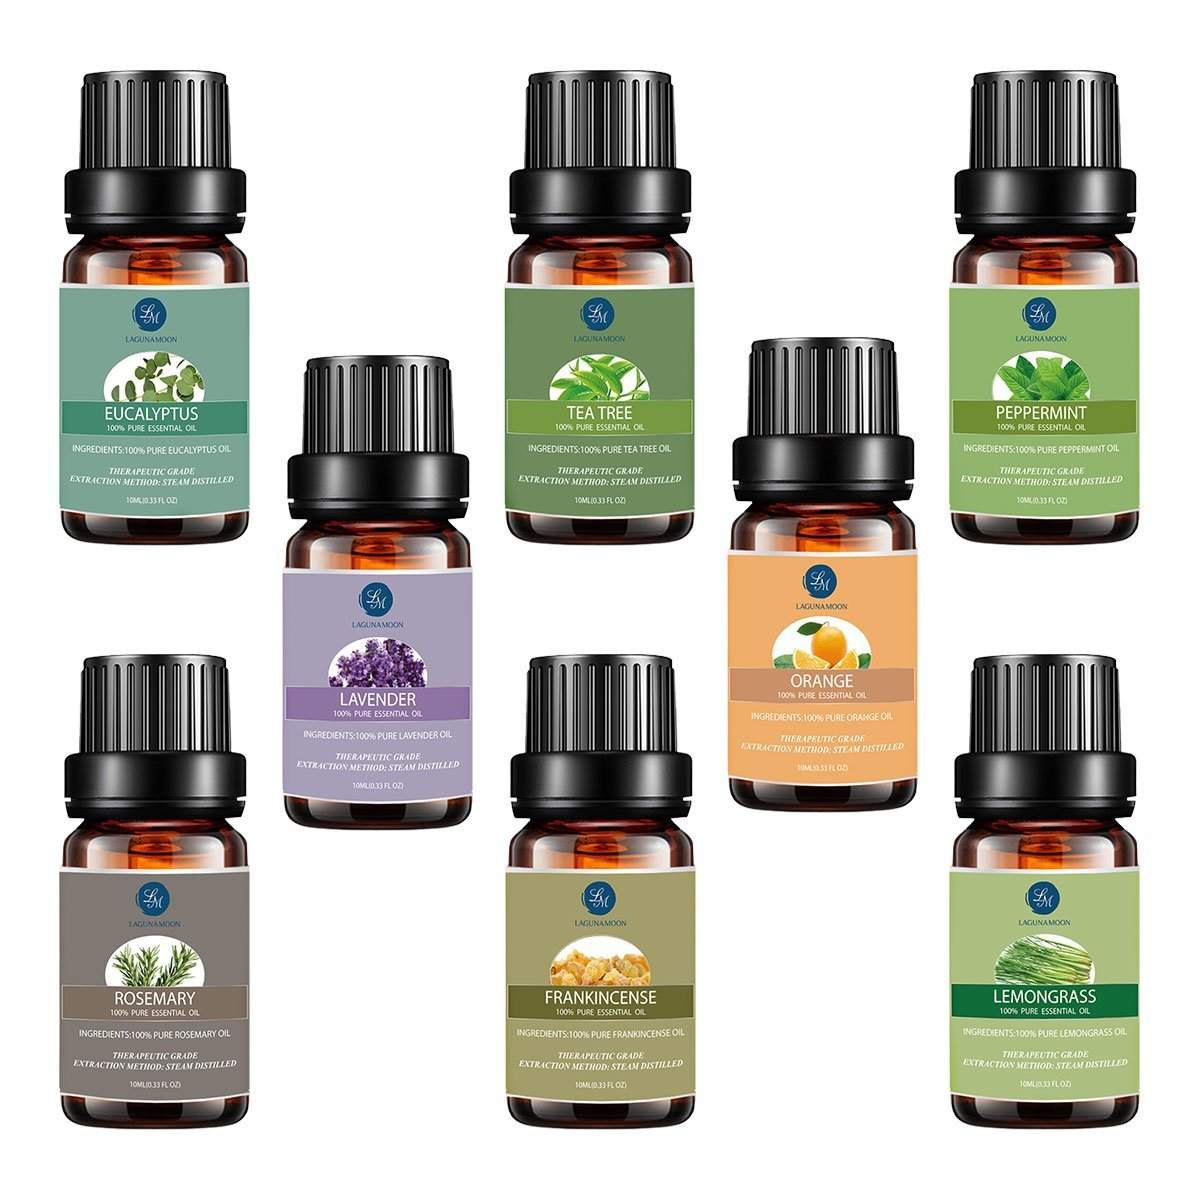 Top 8 Essential Oils Set,Pure Therapeutic Grade Aromatherapy Oils,Lavender,Eucalyptus,Lemongrass,Frankincense,Orange,Rosemary,Peppermint,Tea Tree Essential Oils